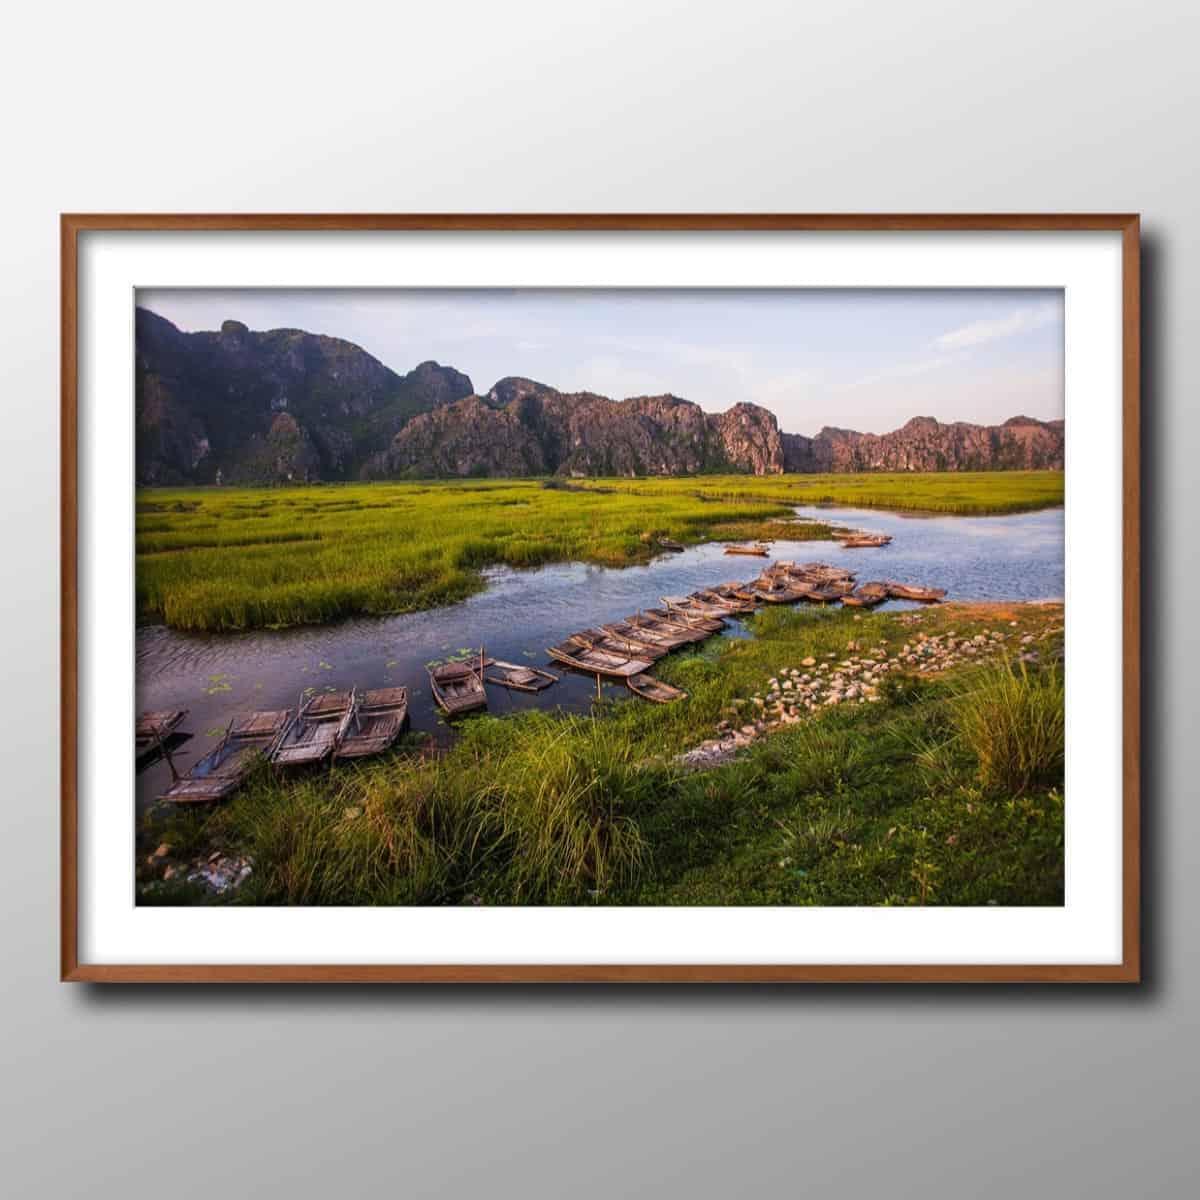 ninh_binh_Van_longvietnam_hanoi_hochiminh_asia_asian_art_photography_photographer_binhdang_print1